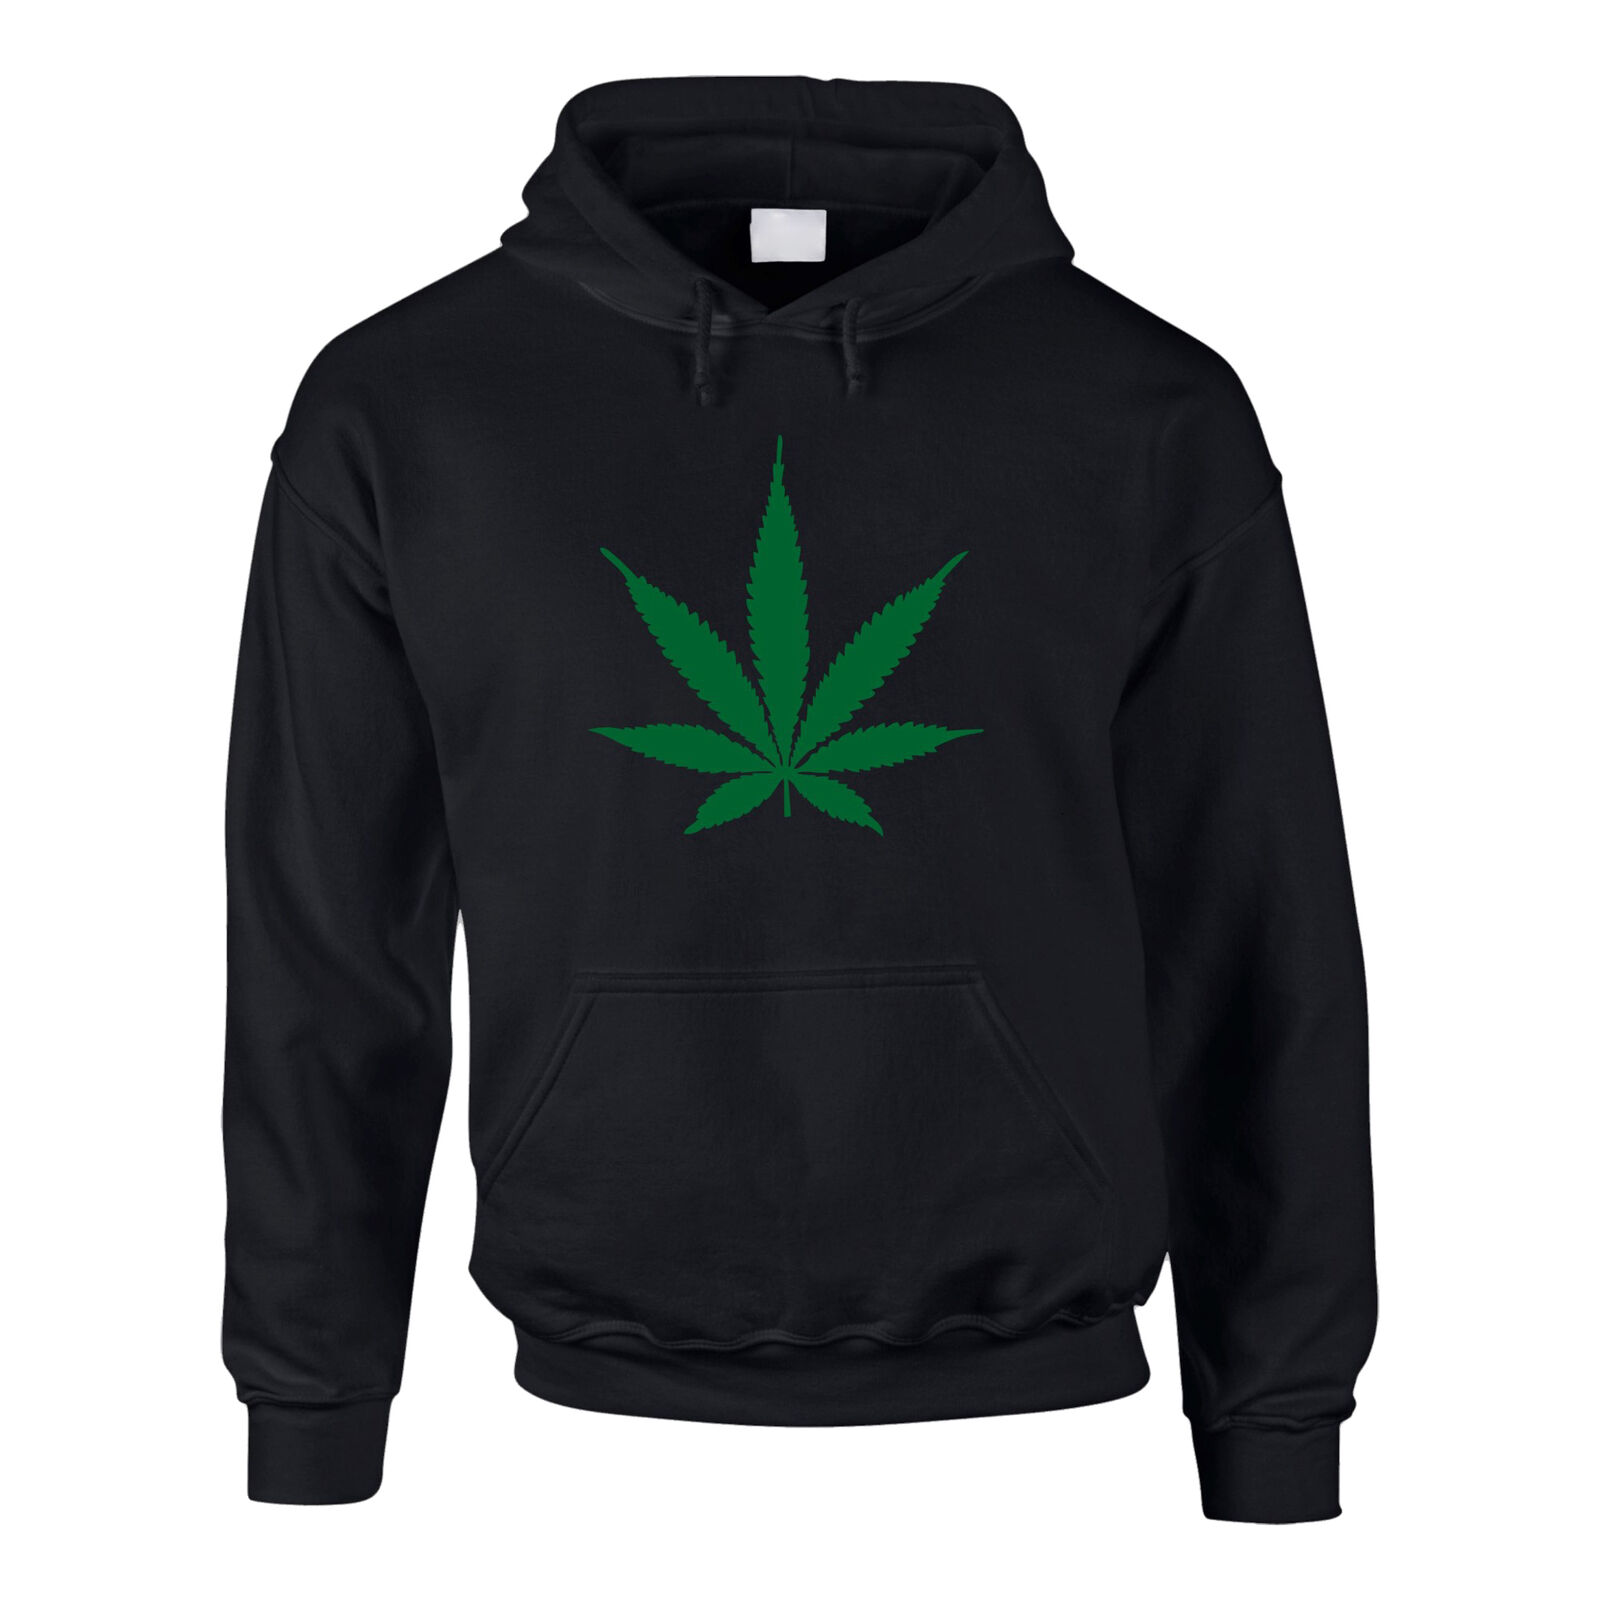 Hoodie Hanfblatt Weed Leaf Kapuzenpullover Hanf Sweater Cannabis XS-5XL